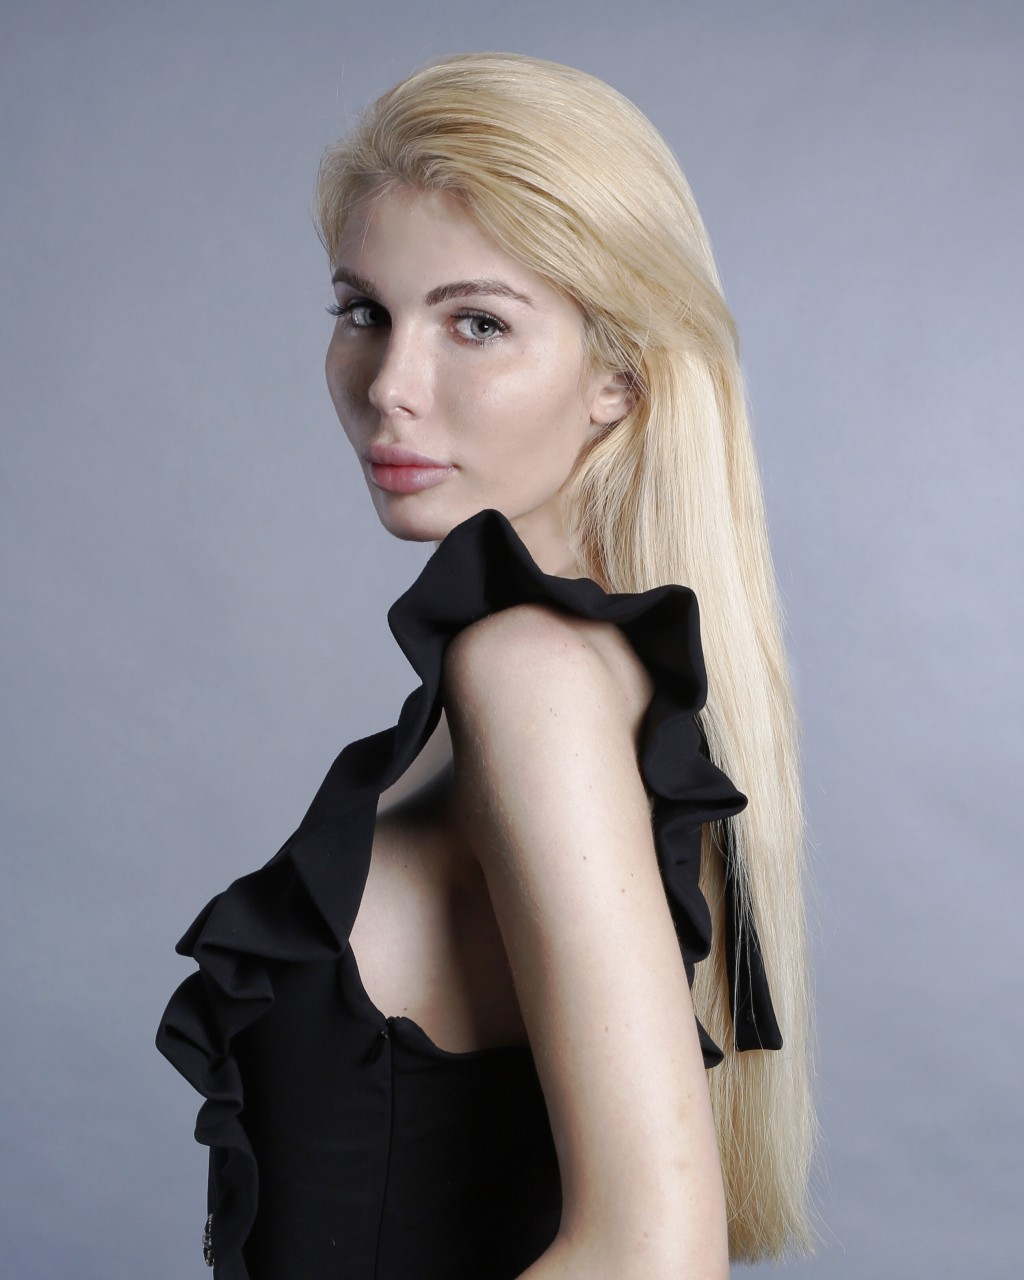 uncut russian escort girls in dubai